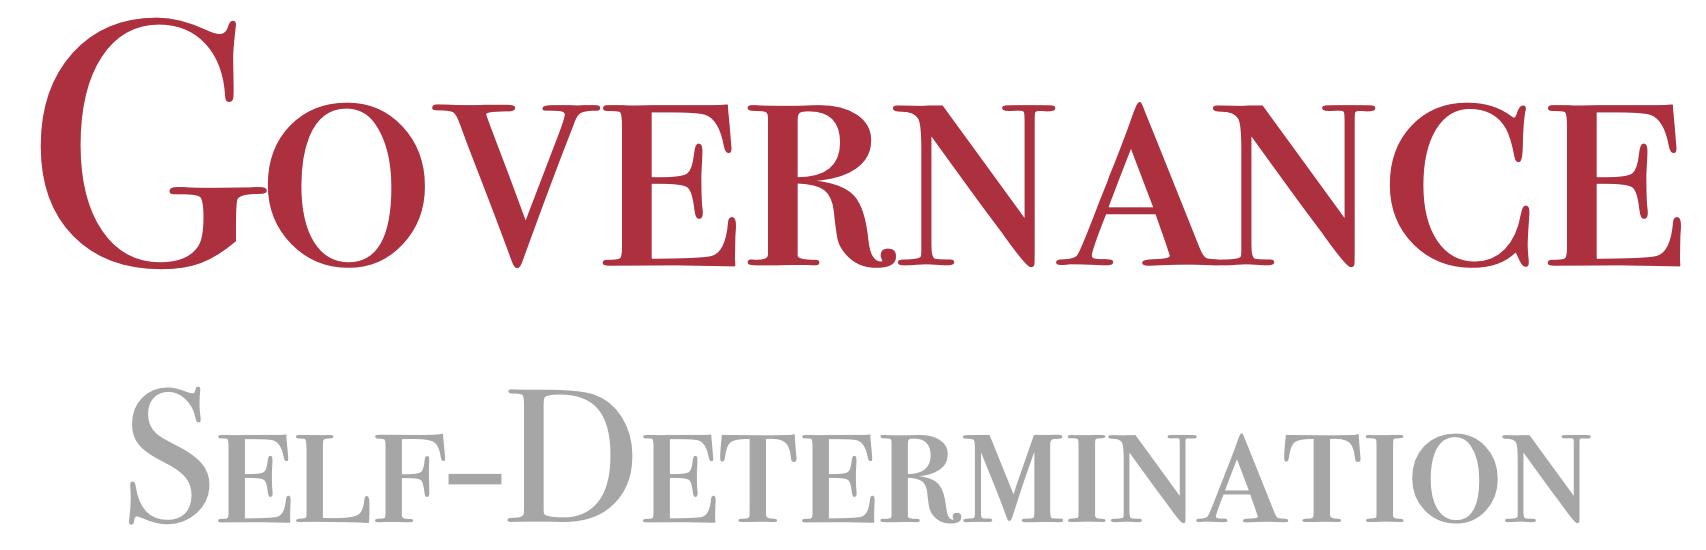 Governance Self-Determination